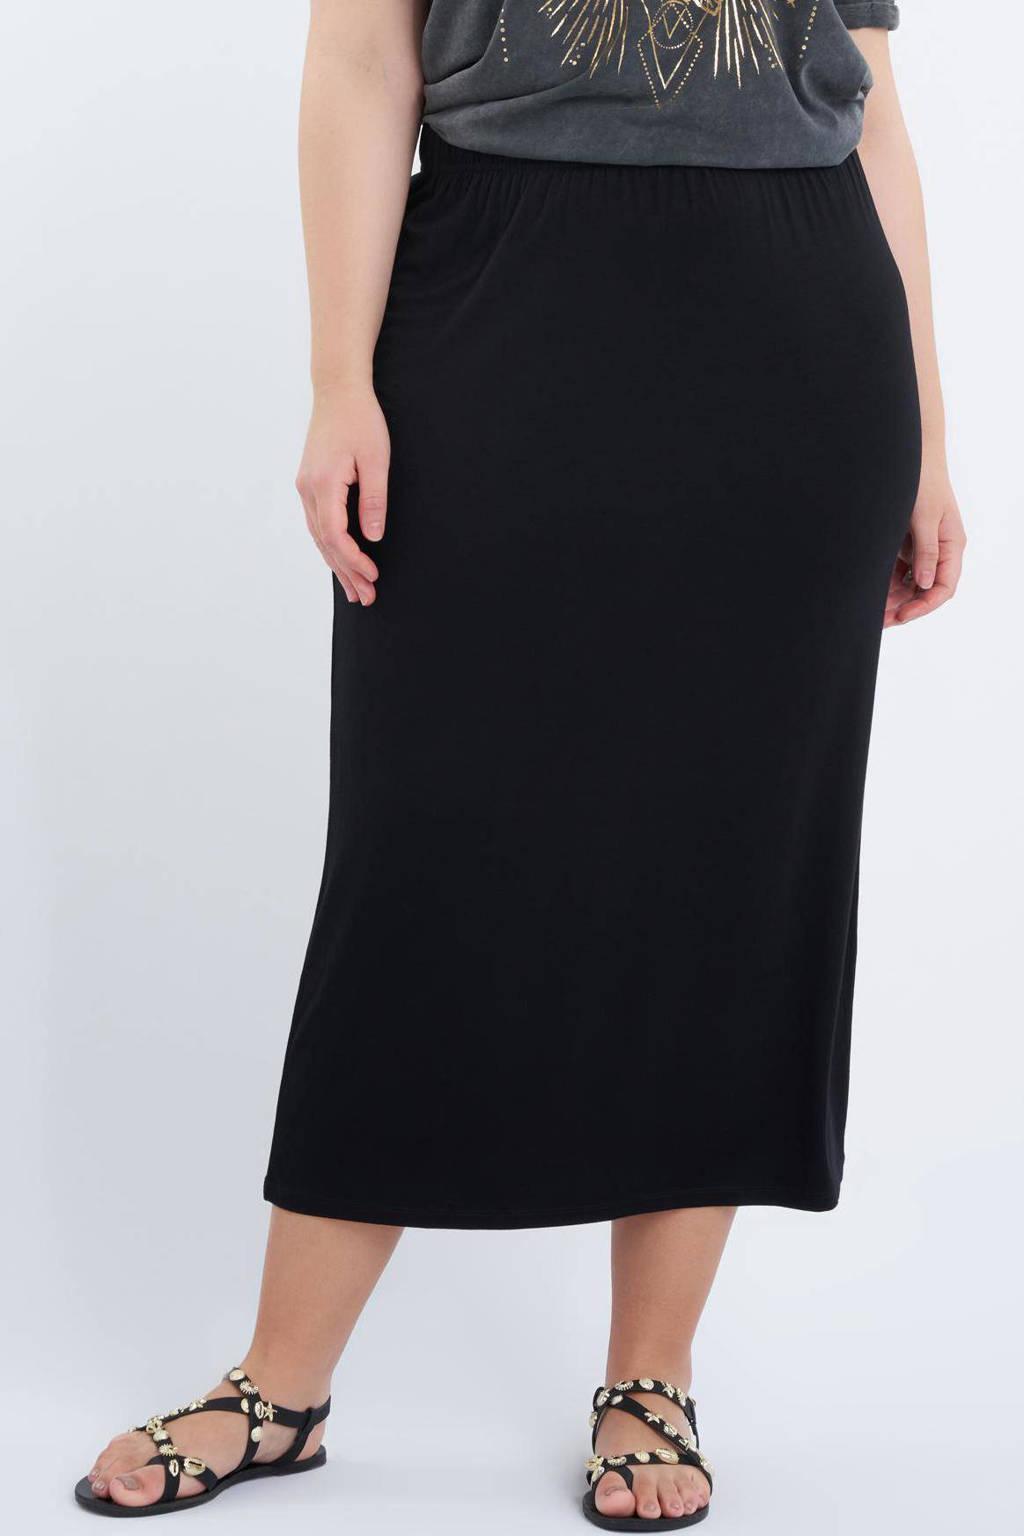 MS Mode midi rok zwart, Zwart